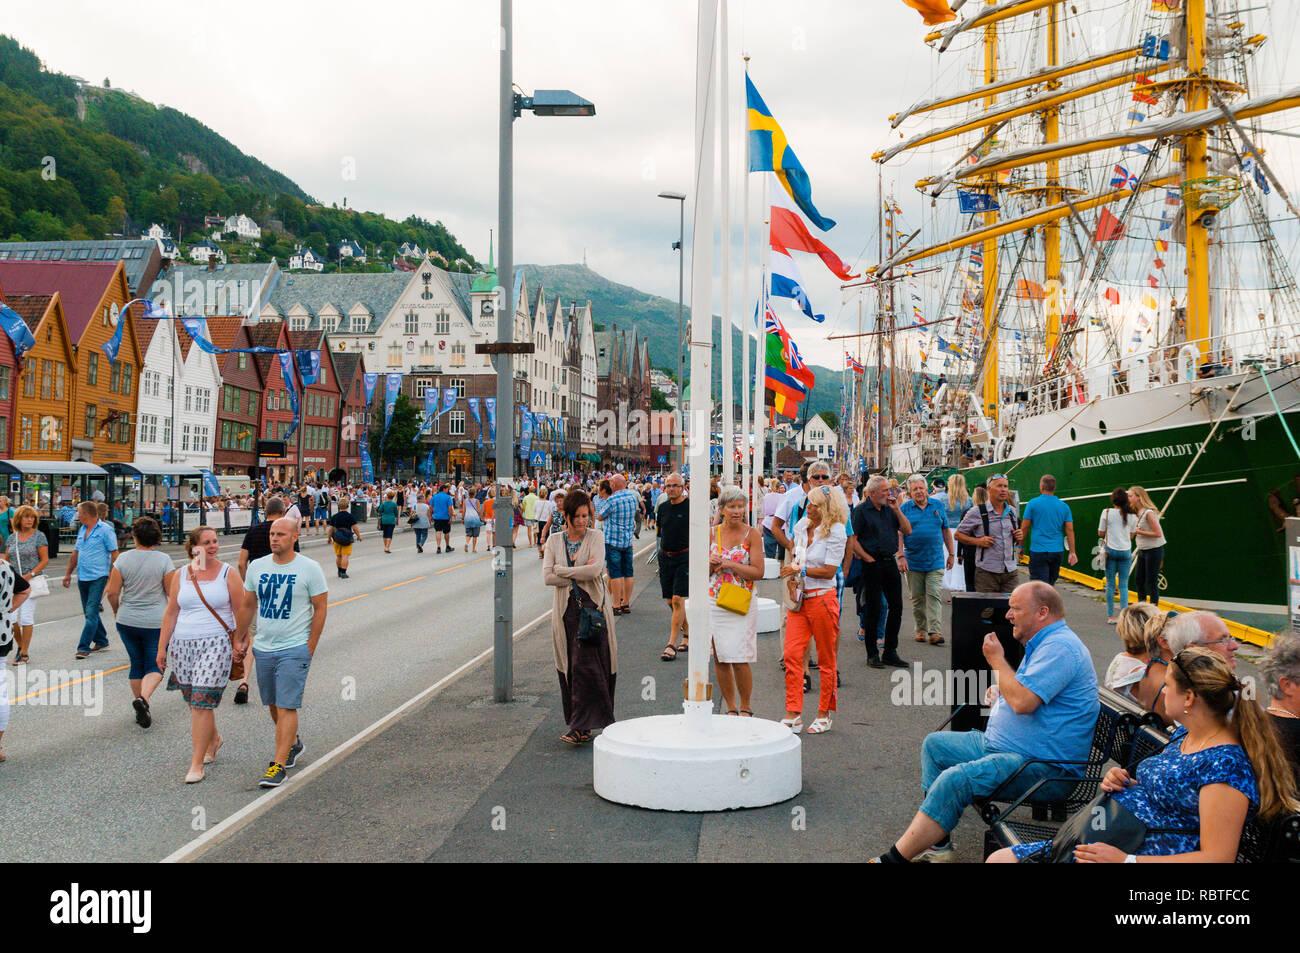 Tall Ship Races 2014, Bryggen Bergen, Norway - Stock Image